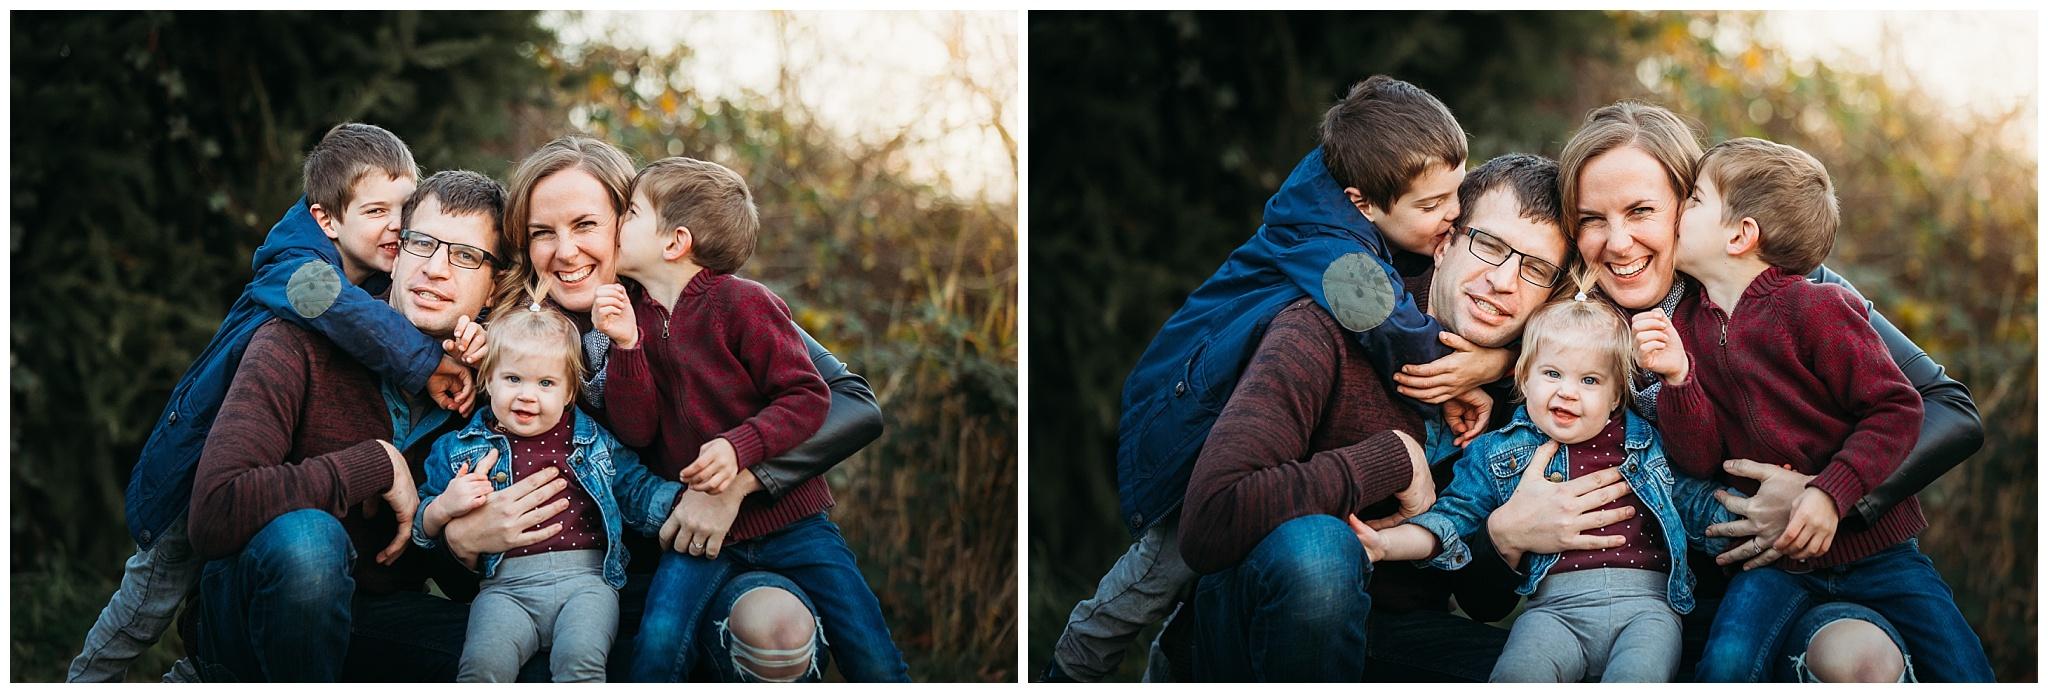 Abbotsford-Family-Photographer-24.jpg